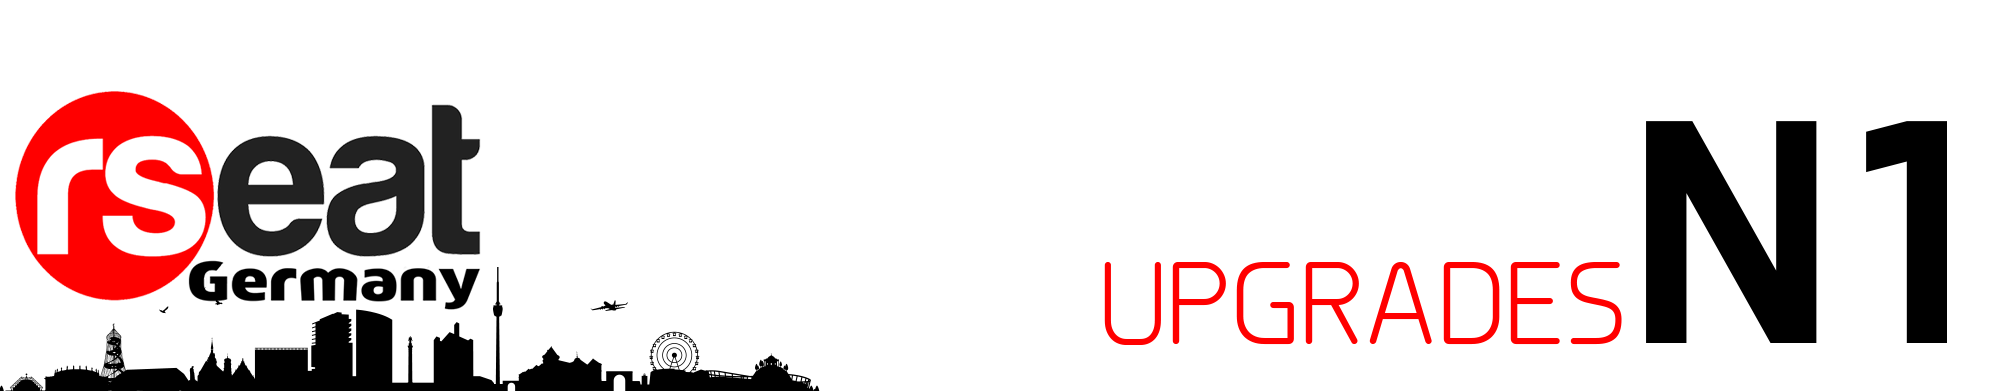 rseat_germany_FB_4_ohne_VRL_N1_2000_upgrades